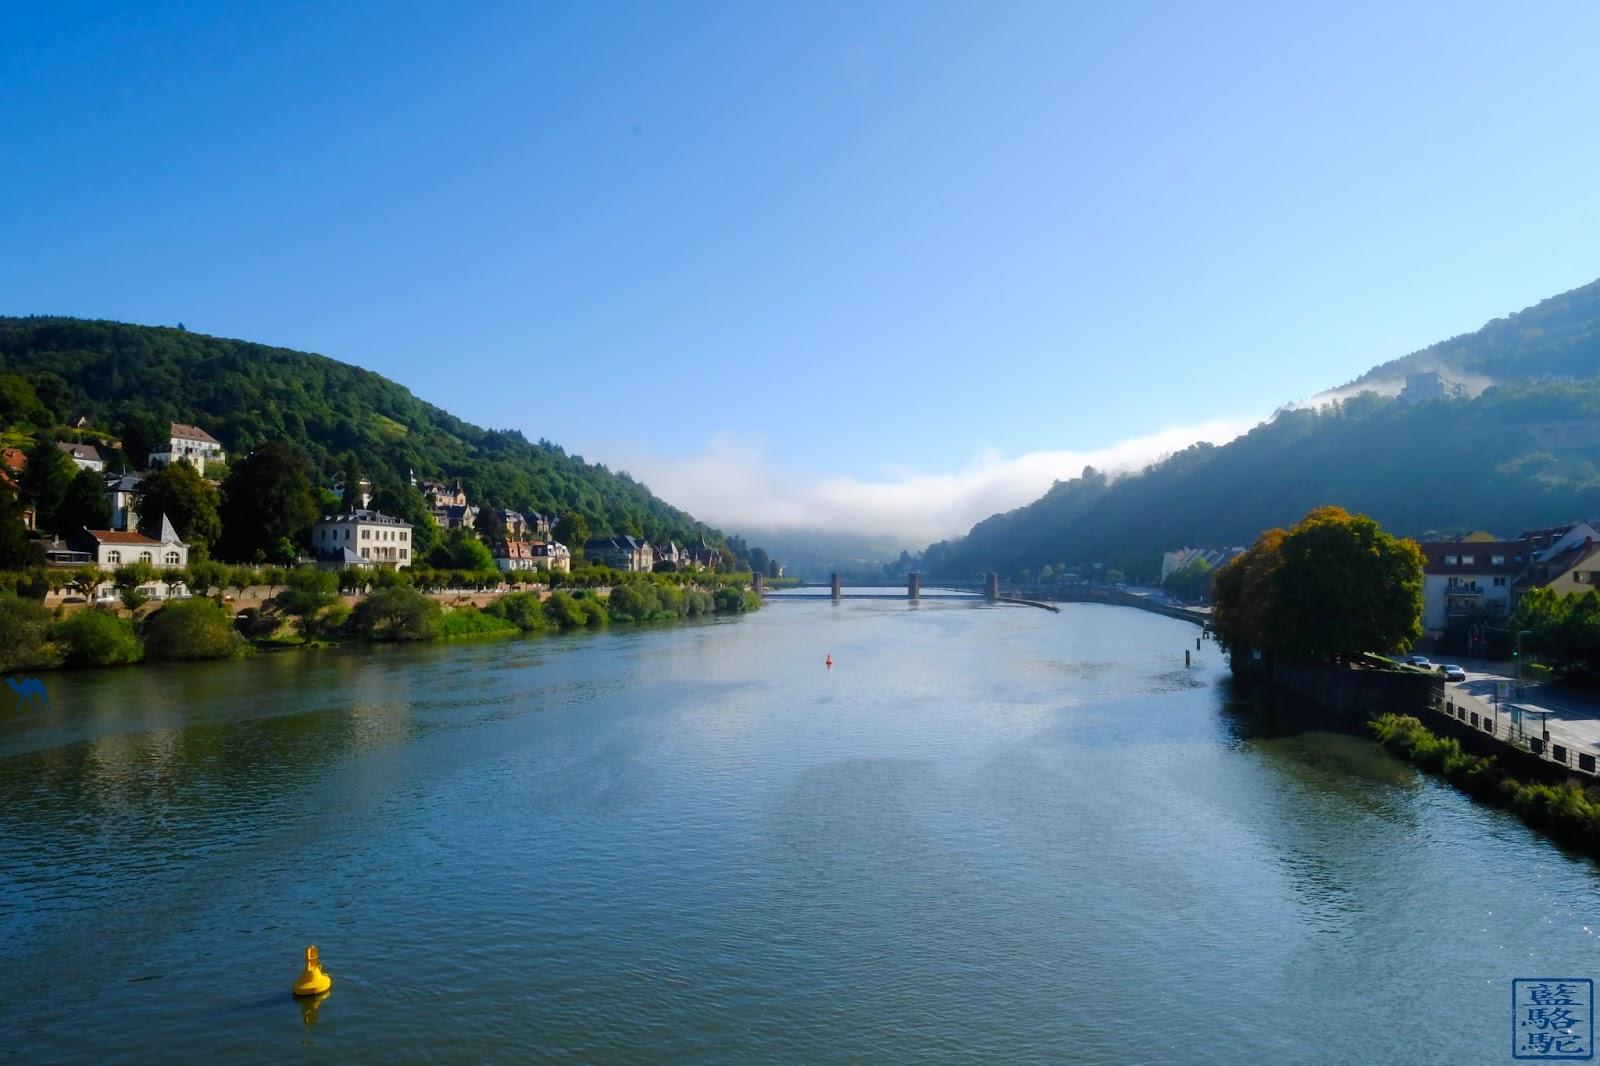 Le Chameau Bleu - Le Neckar